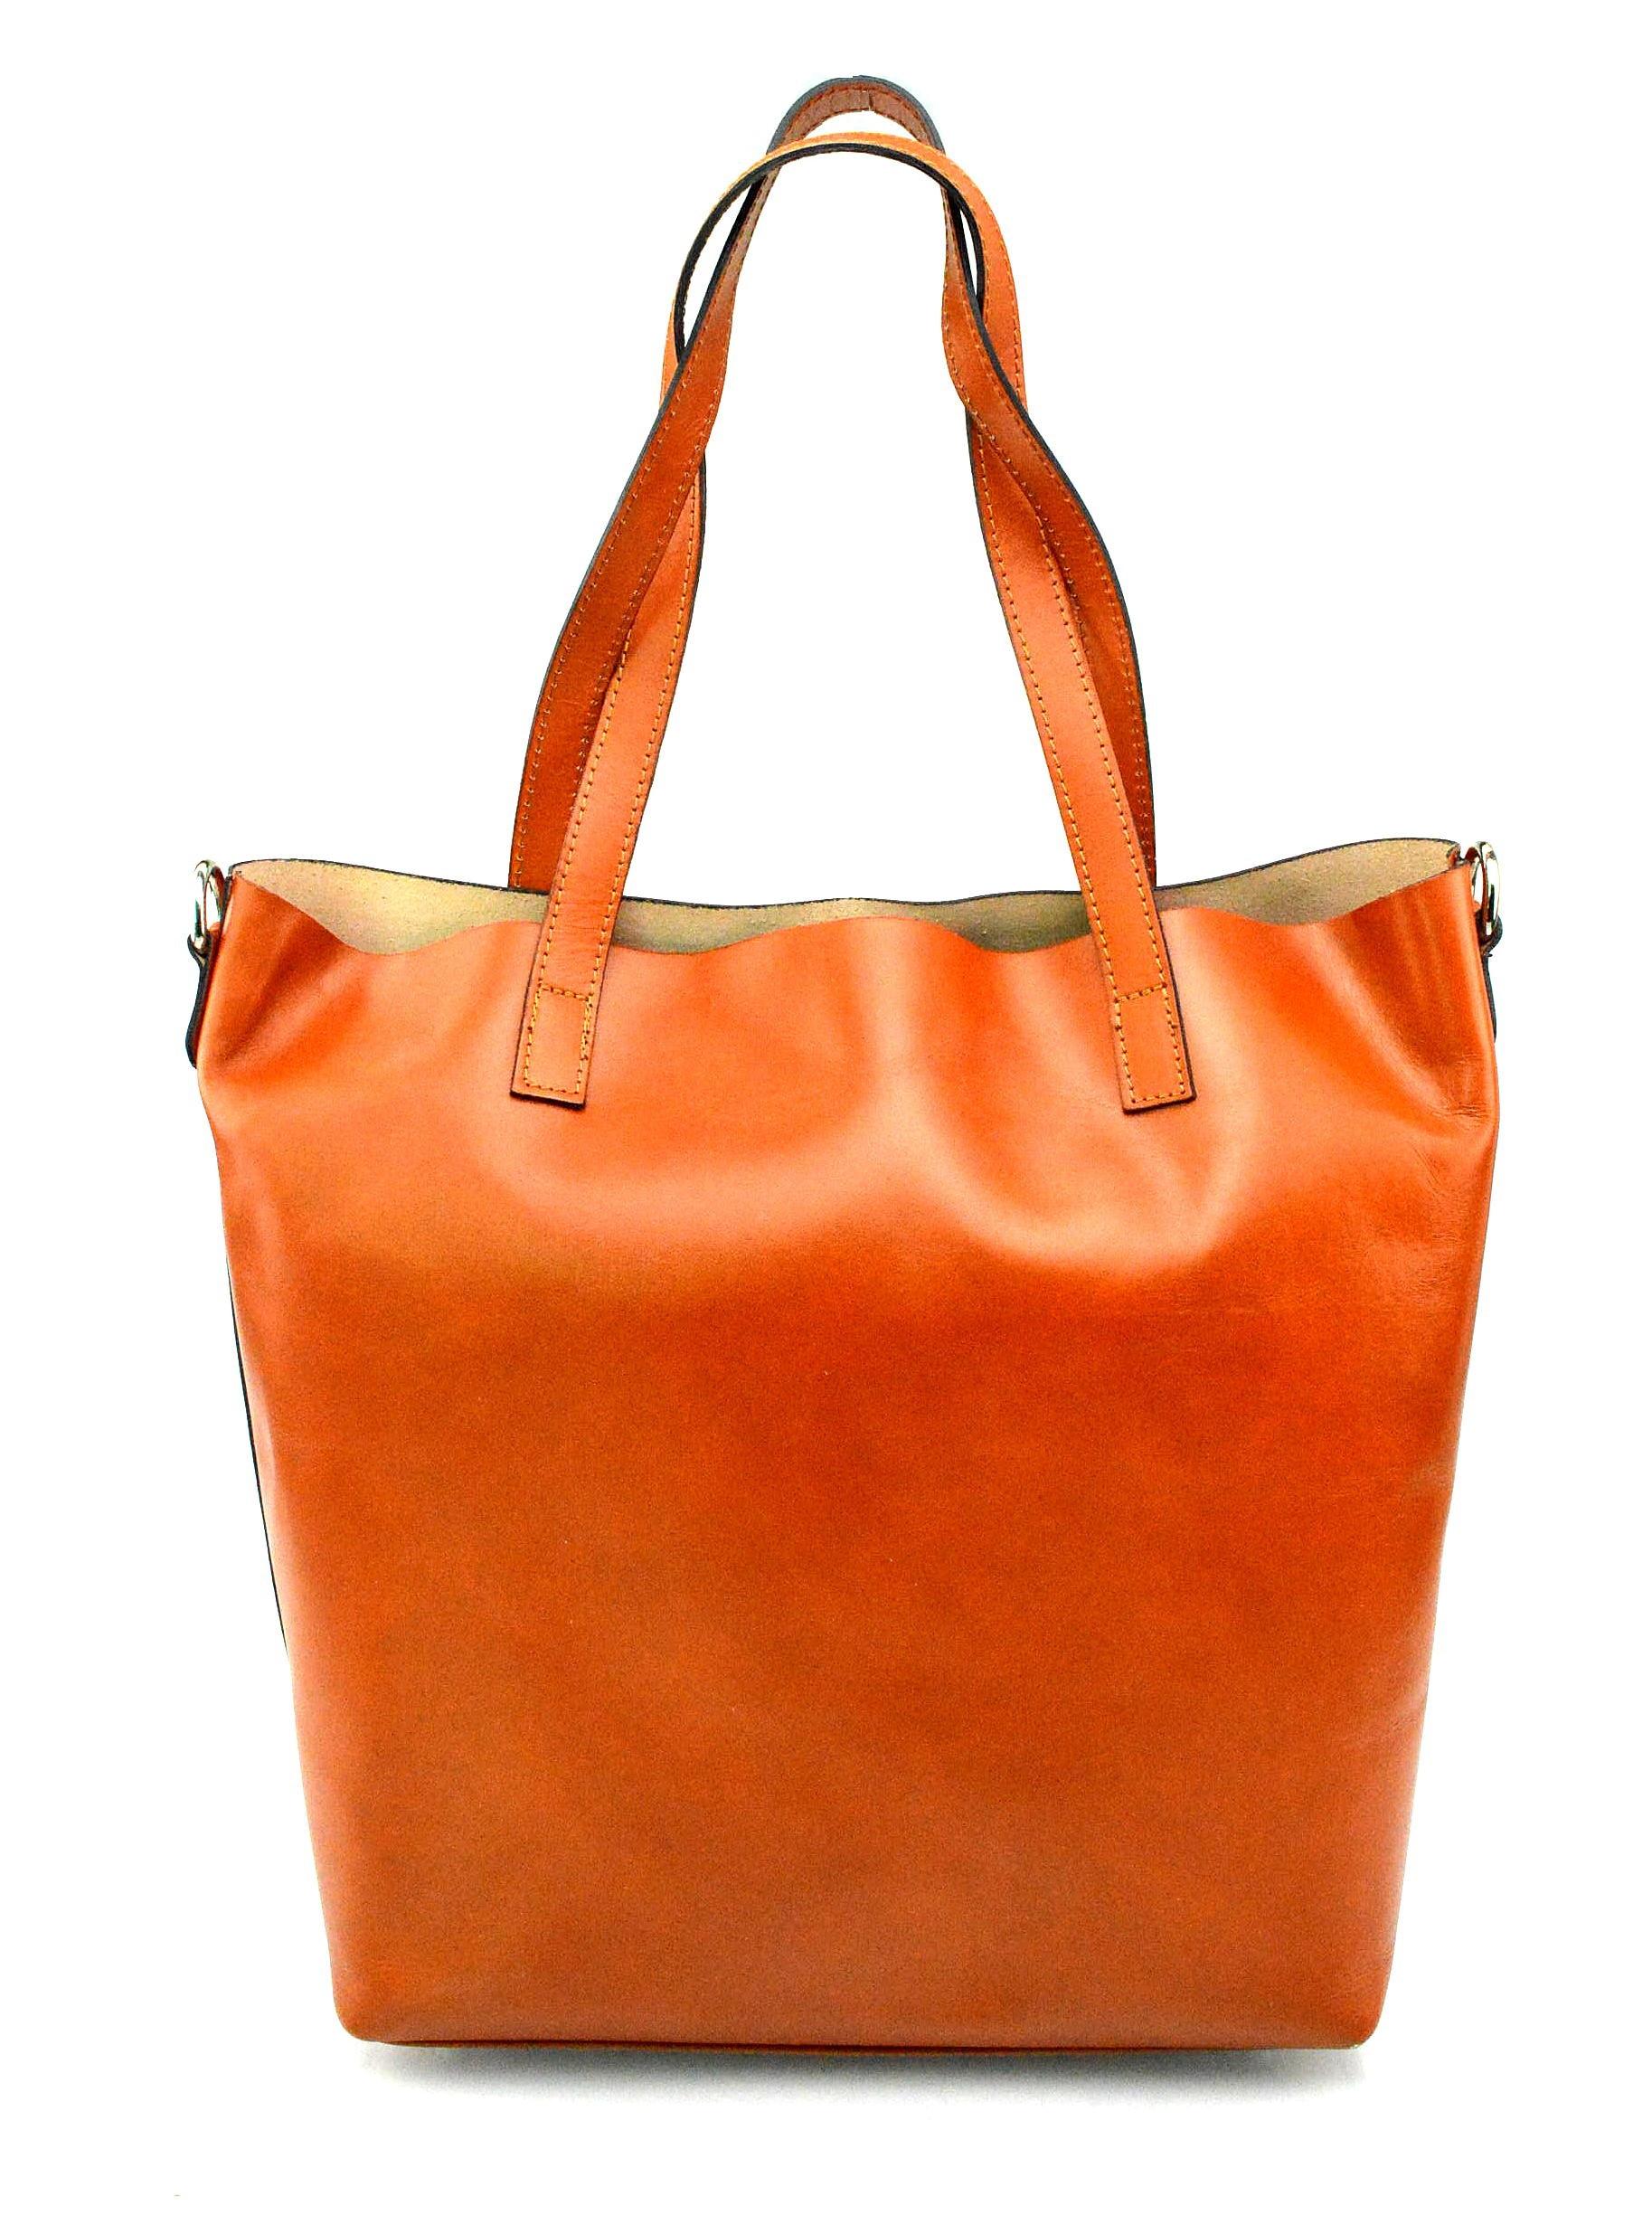 Kožená praktická mahagonově hnědá velká taška Evita 2v1